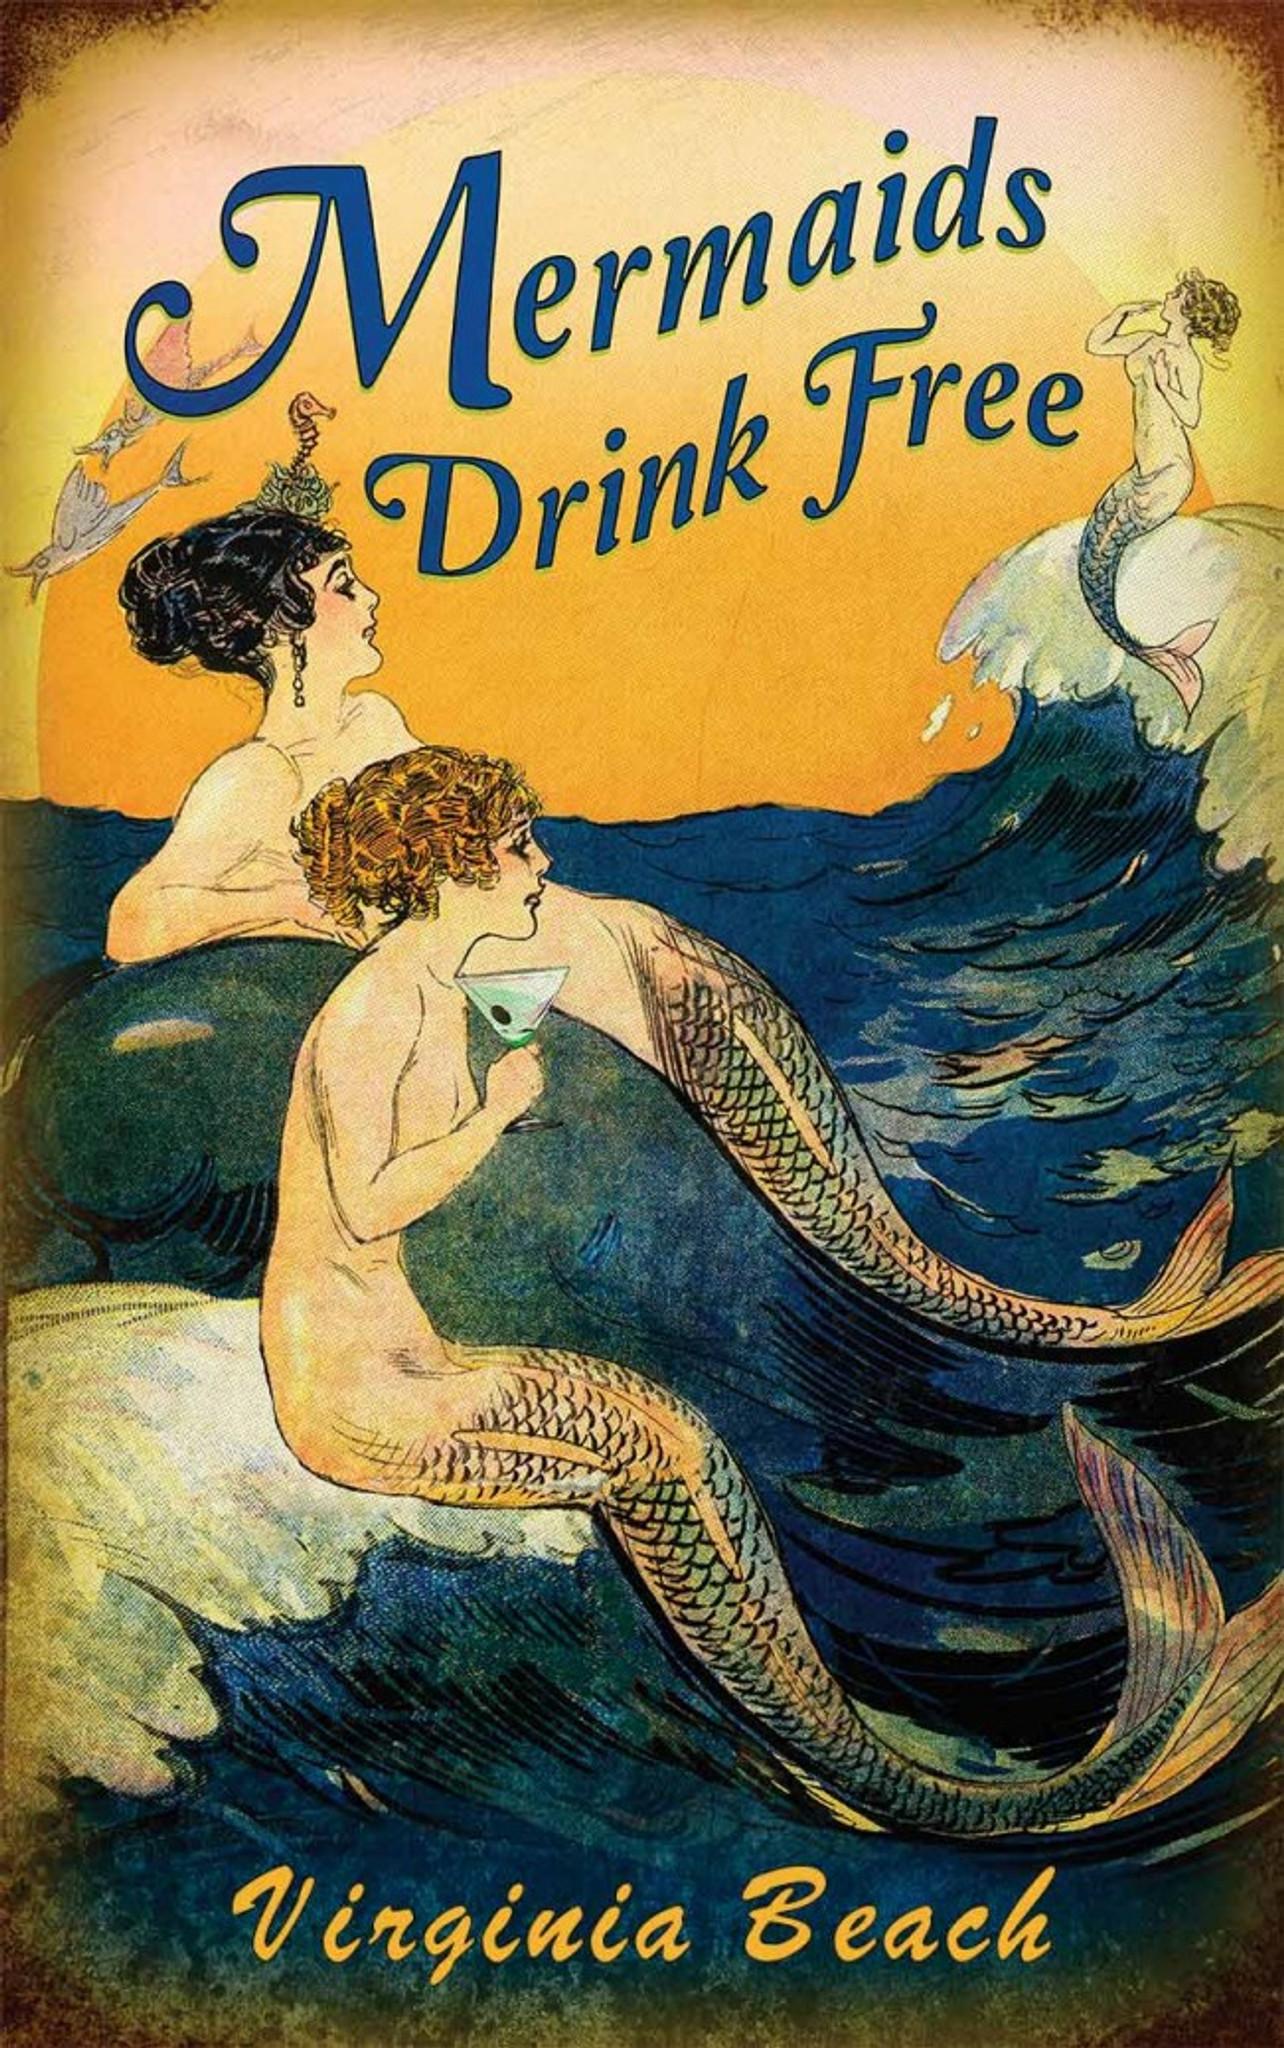 Mermaids Drink Free VIRGINIA BEACH Metal Sign 12 x 18 Inches